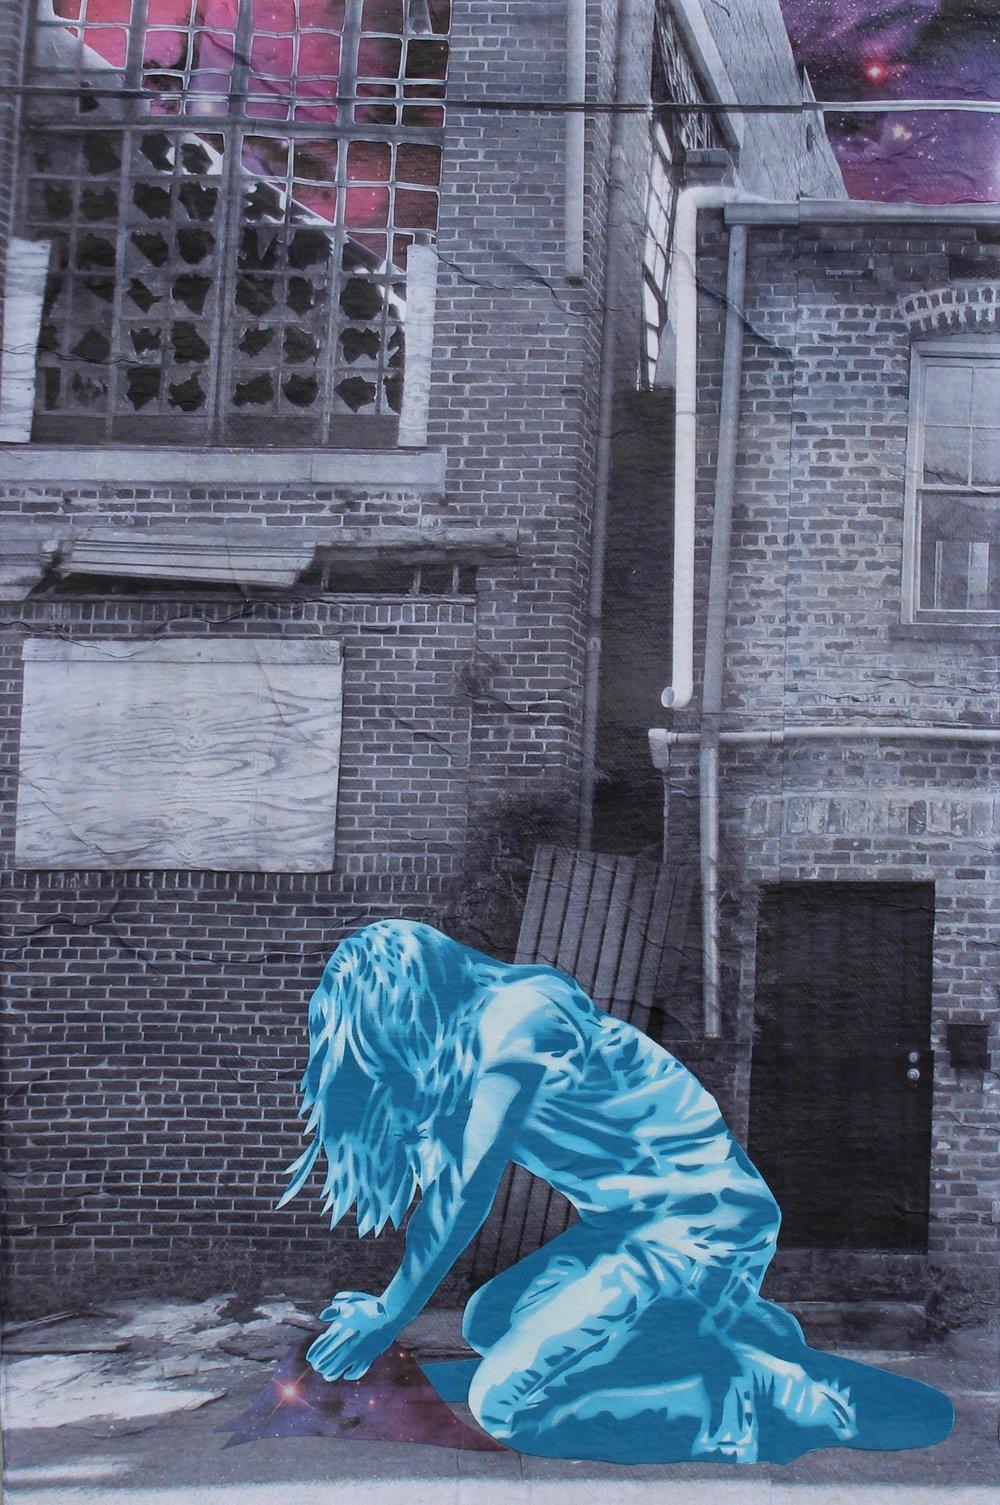 - Seeds of Kindness 14hand-cut stencil, spray paint, photograph (Savannah), paper, acrylic on canvas, framed, 2018, 16